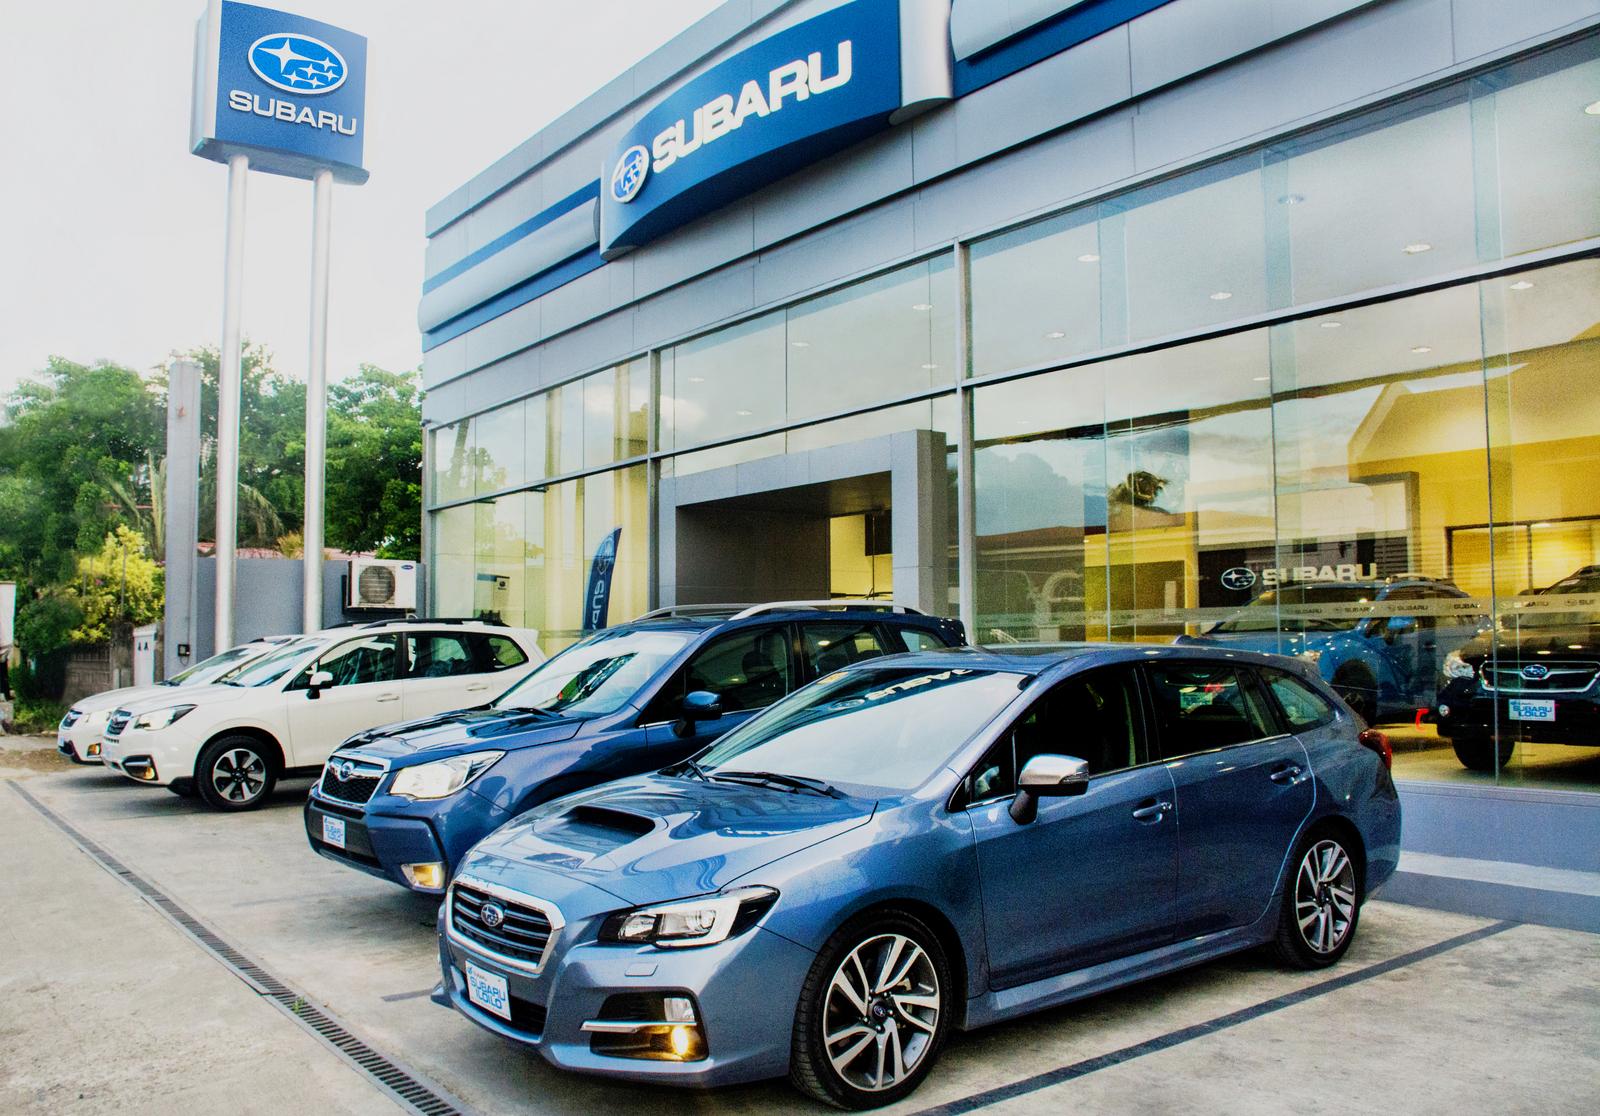 Subaru iloilo gets ilonggos to experience confidence in motion